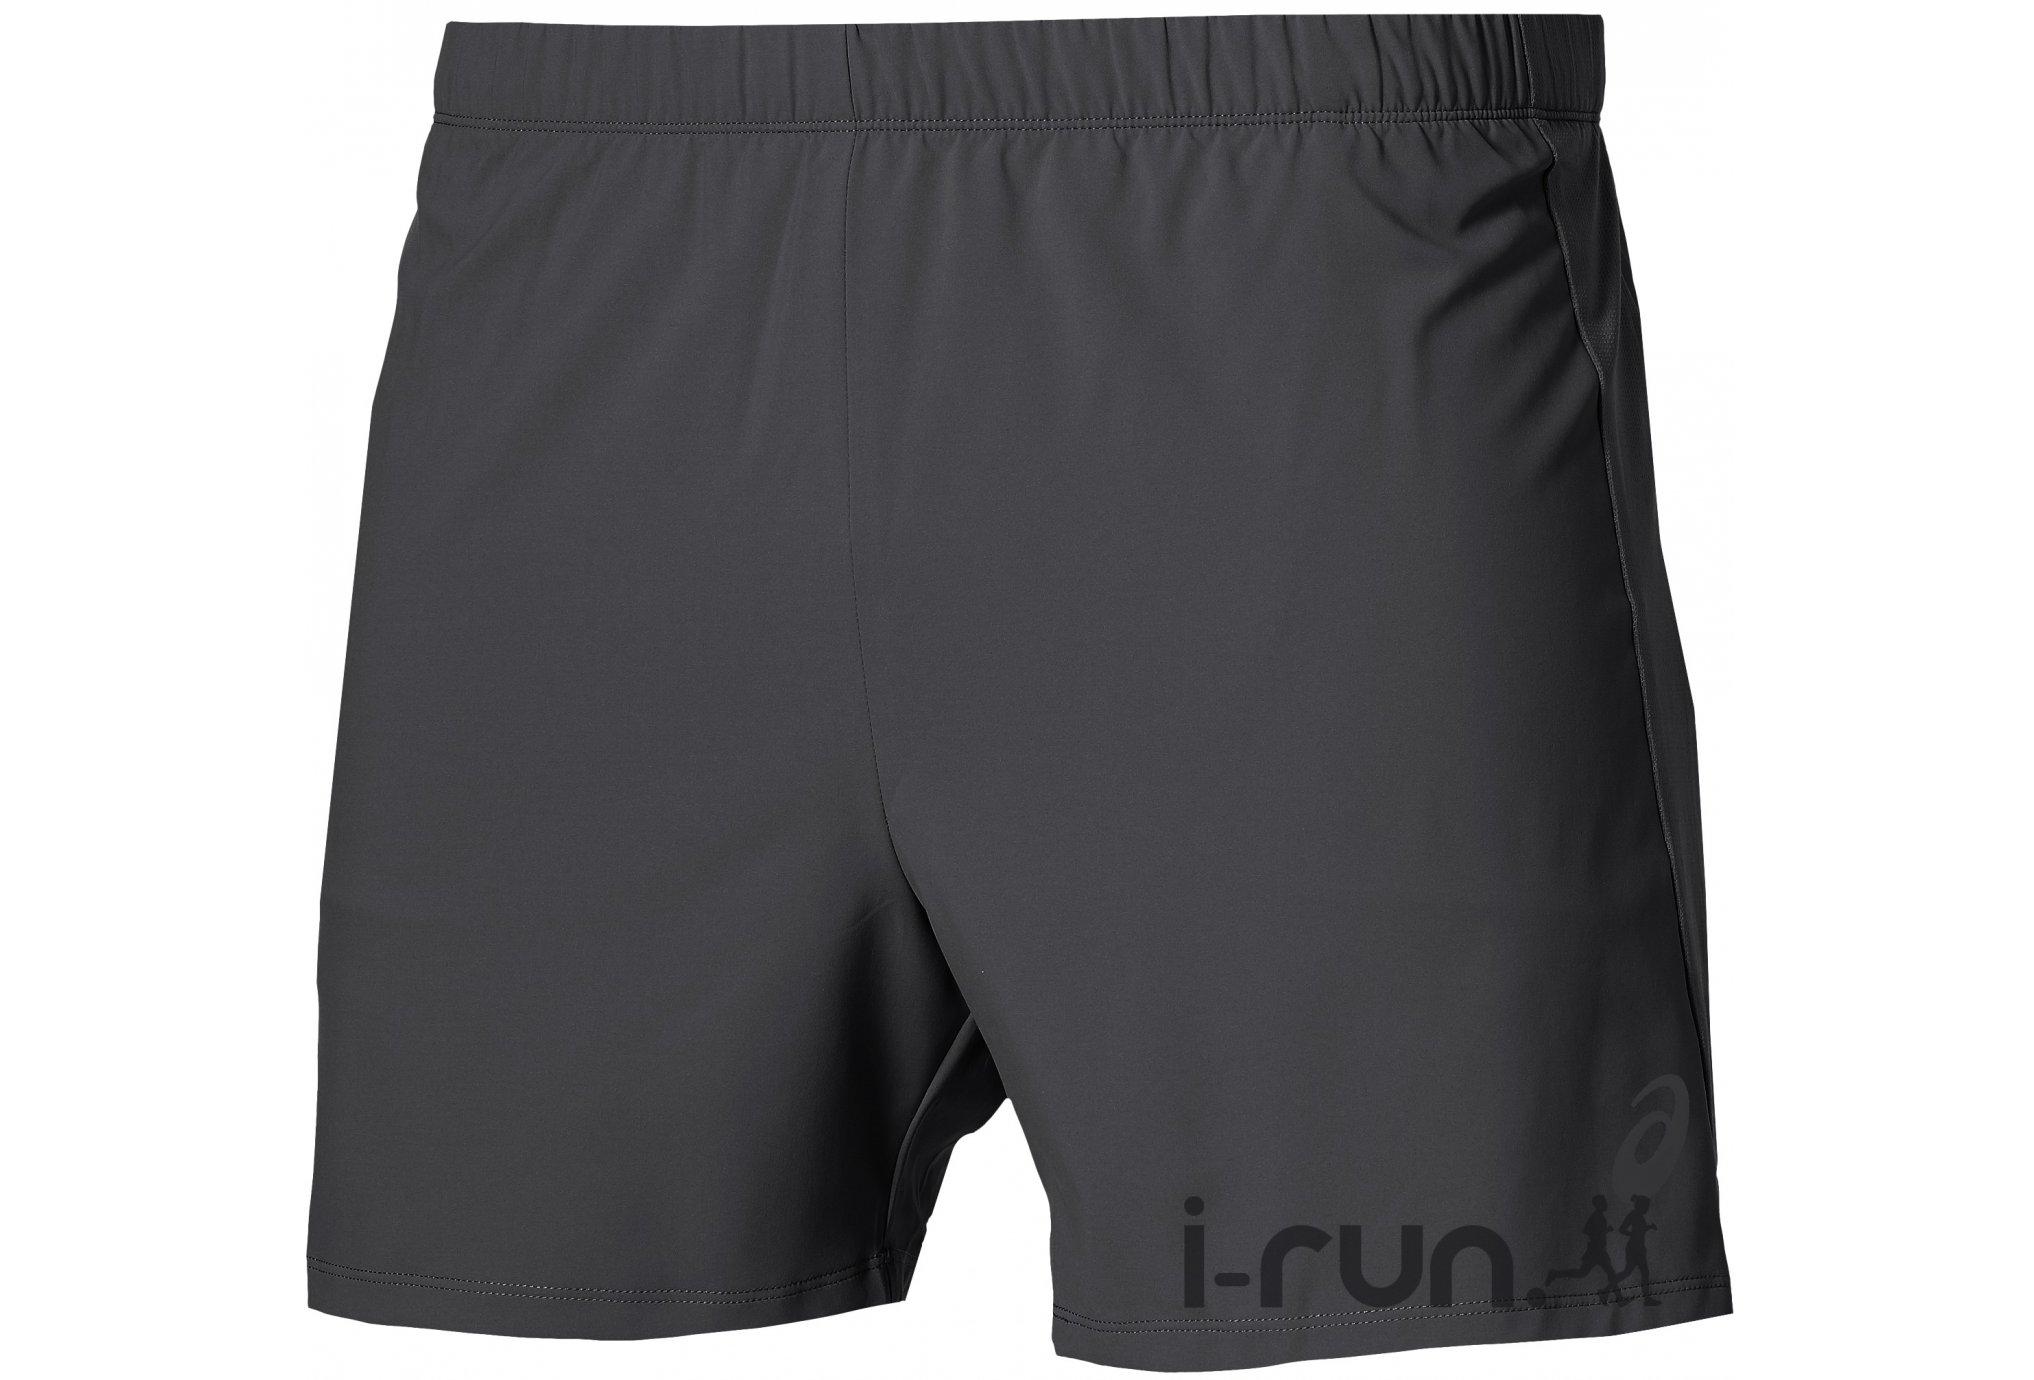 Asics Short 2 en 1 5inch M vêtement running homme